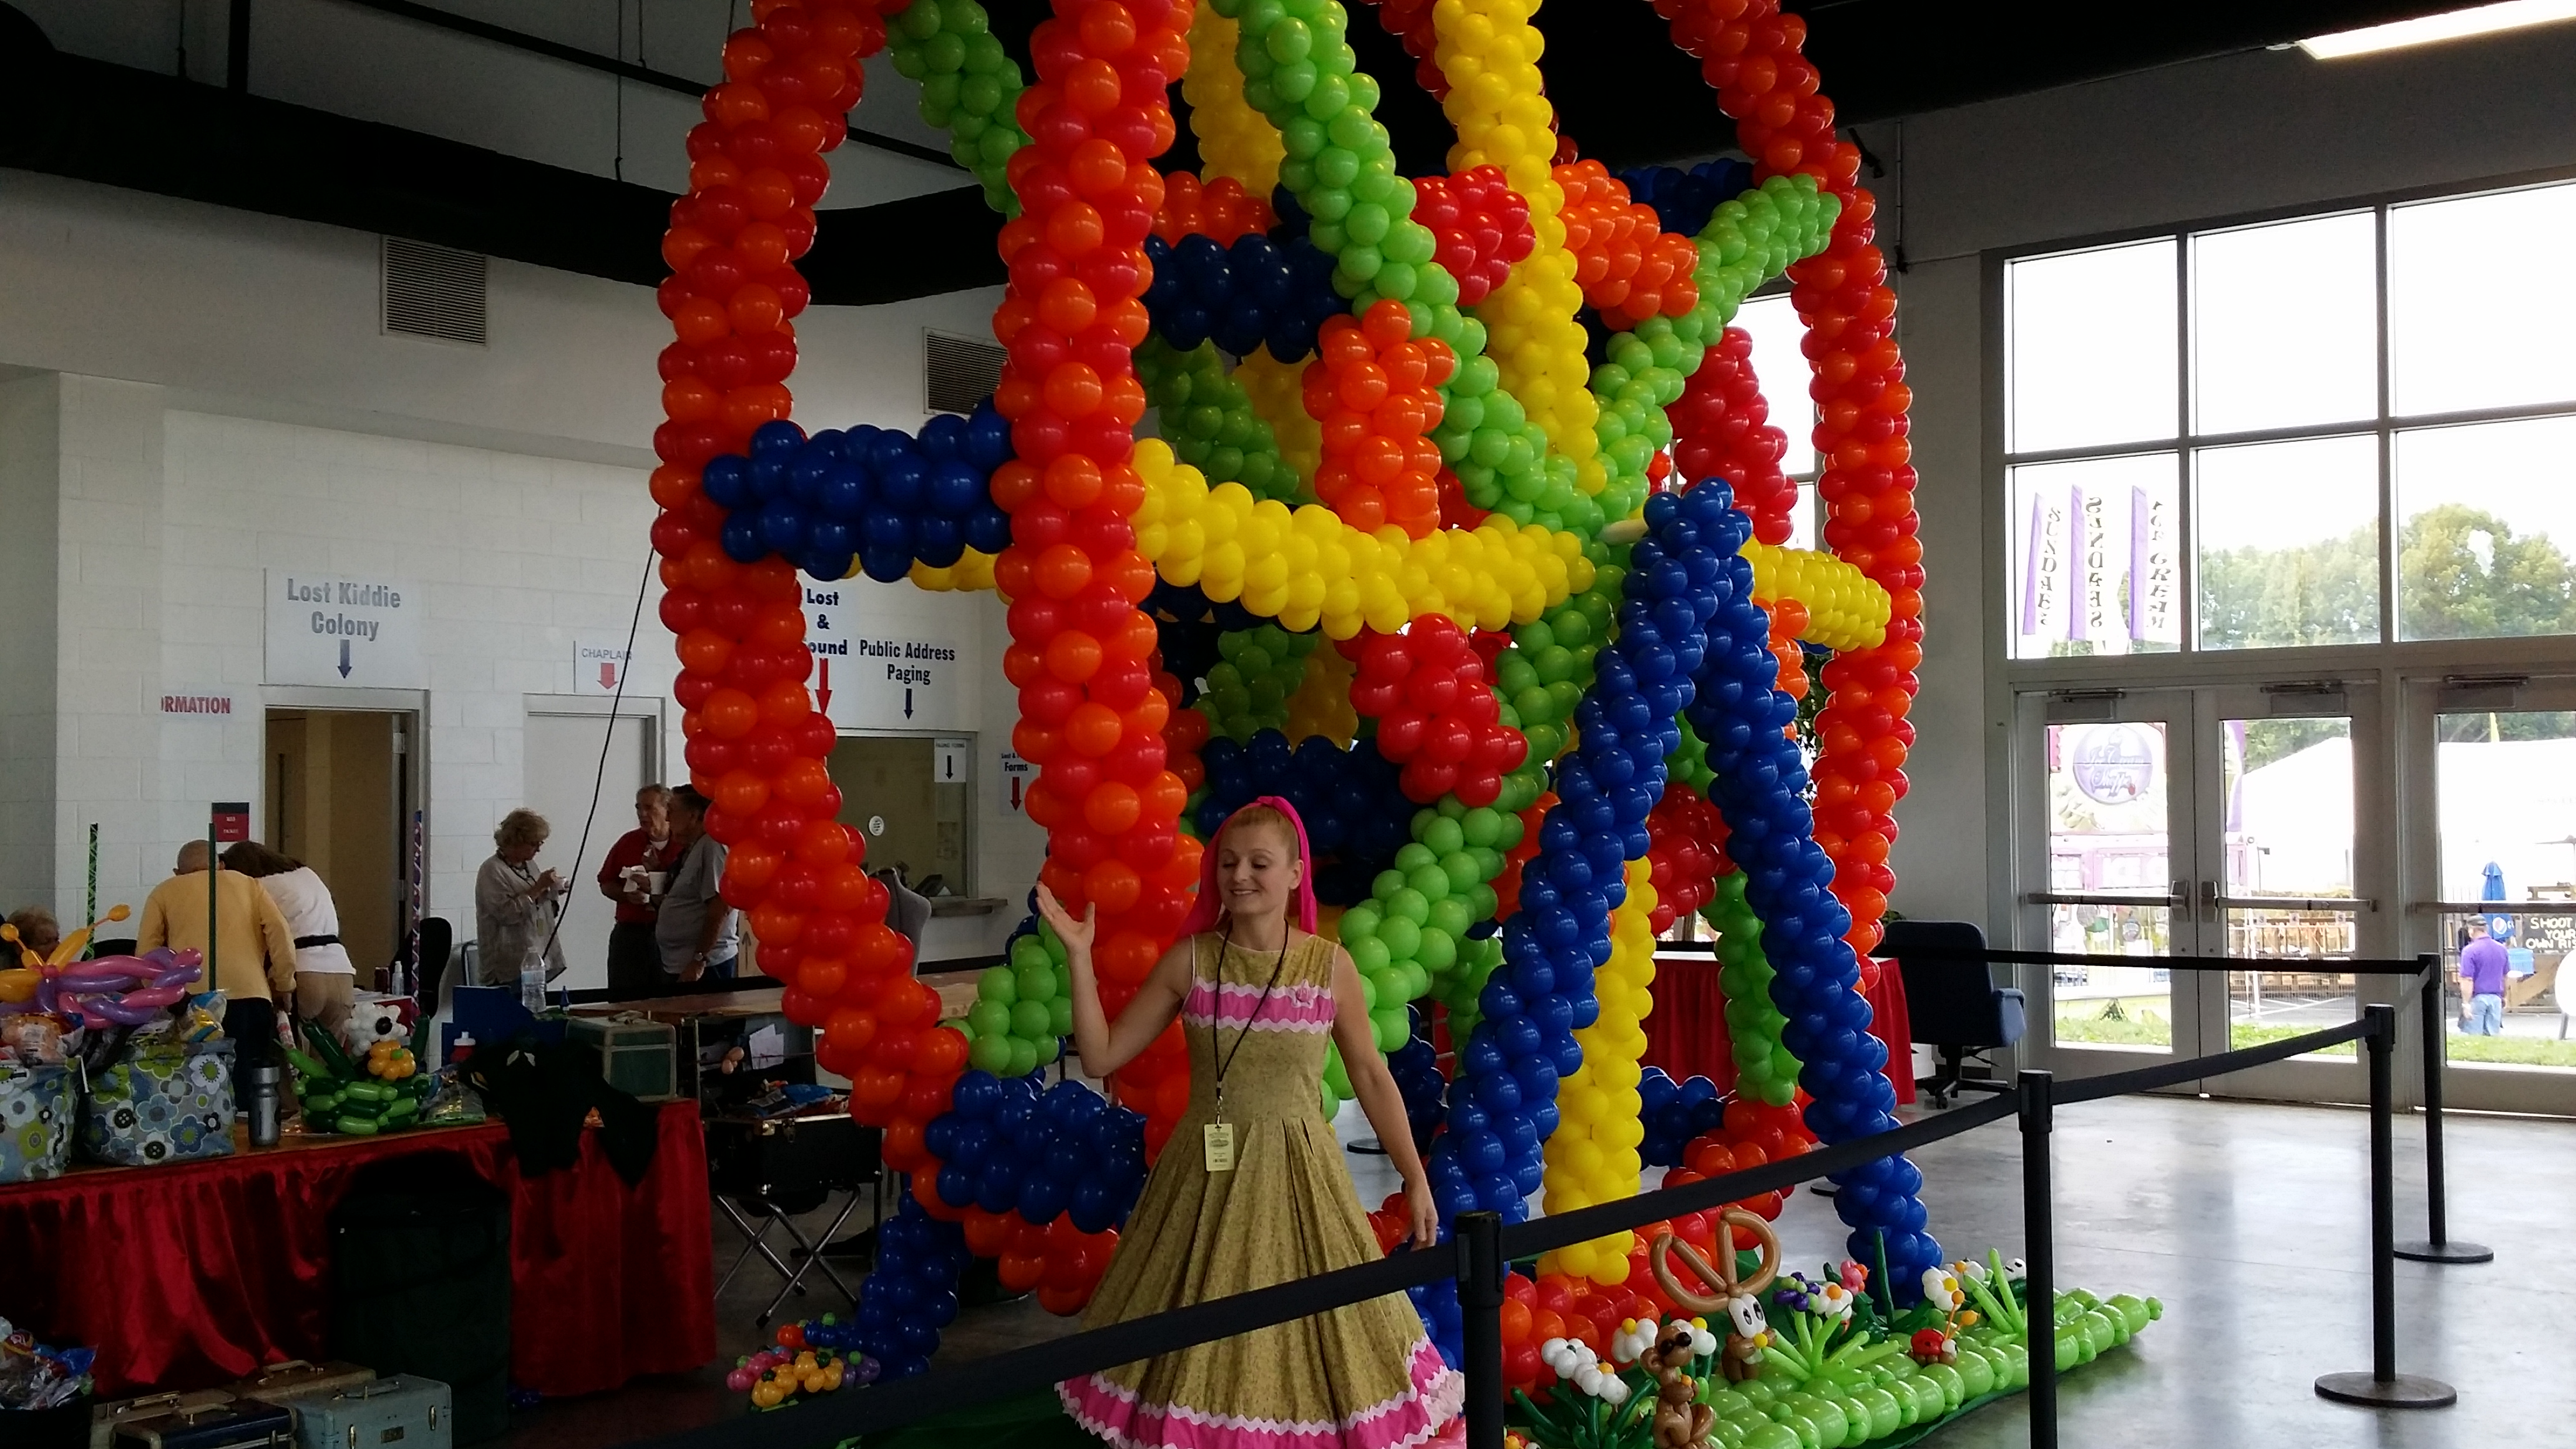 Omaha Balloon Decorating Experts